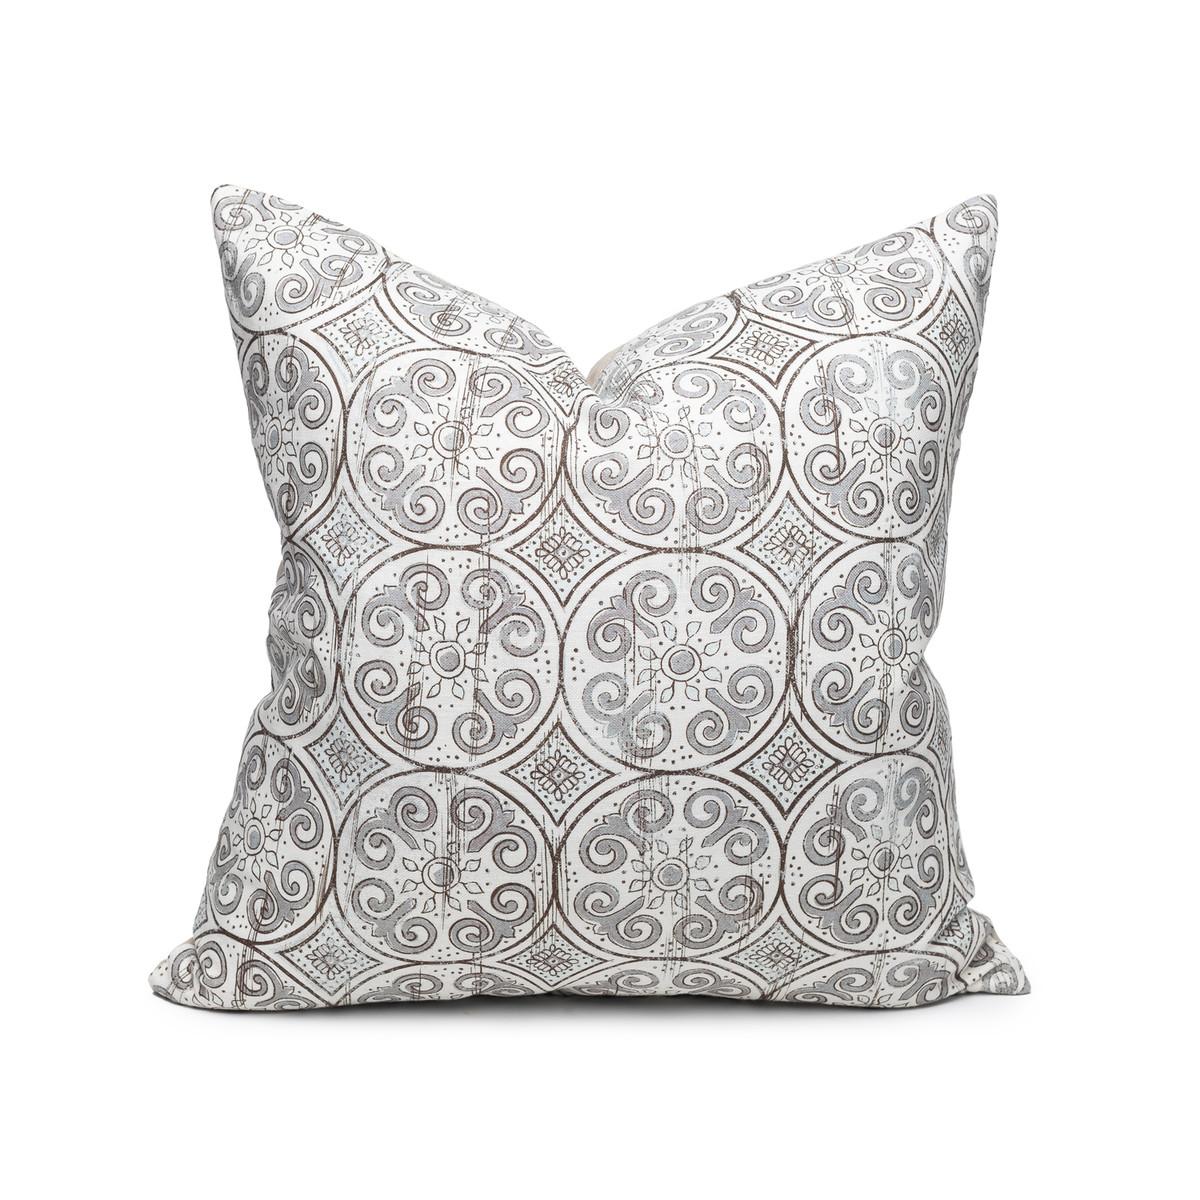 Jaipur Dreams Pewter Pillow - 22 - Front